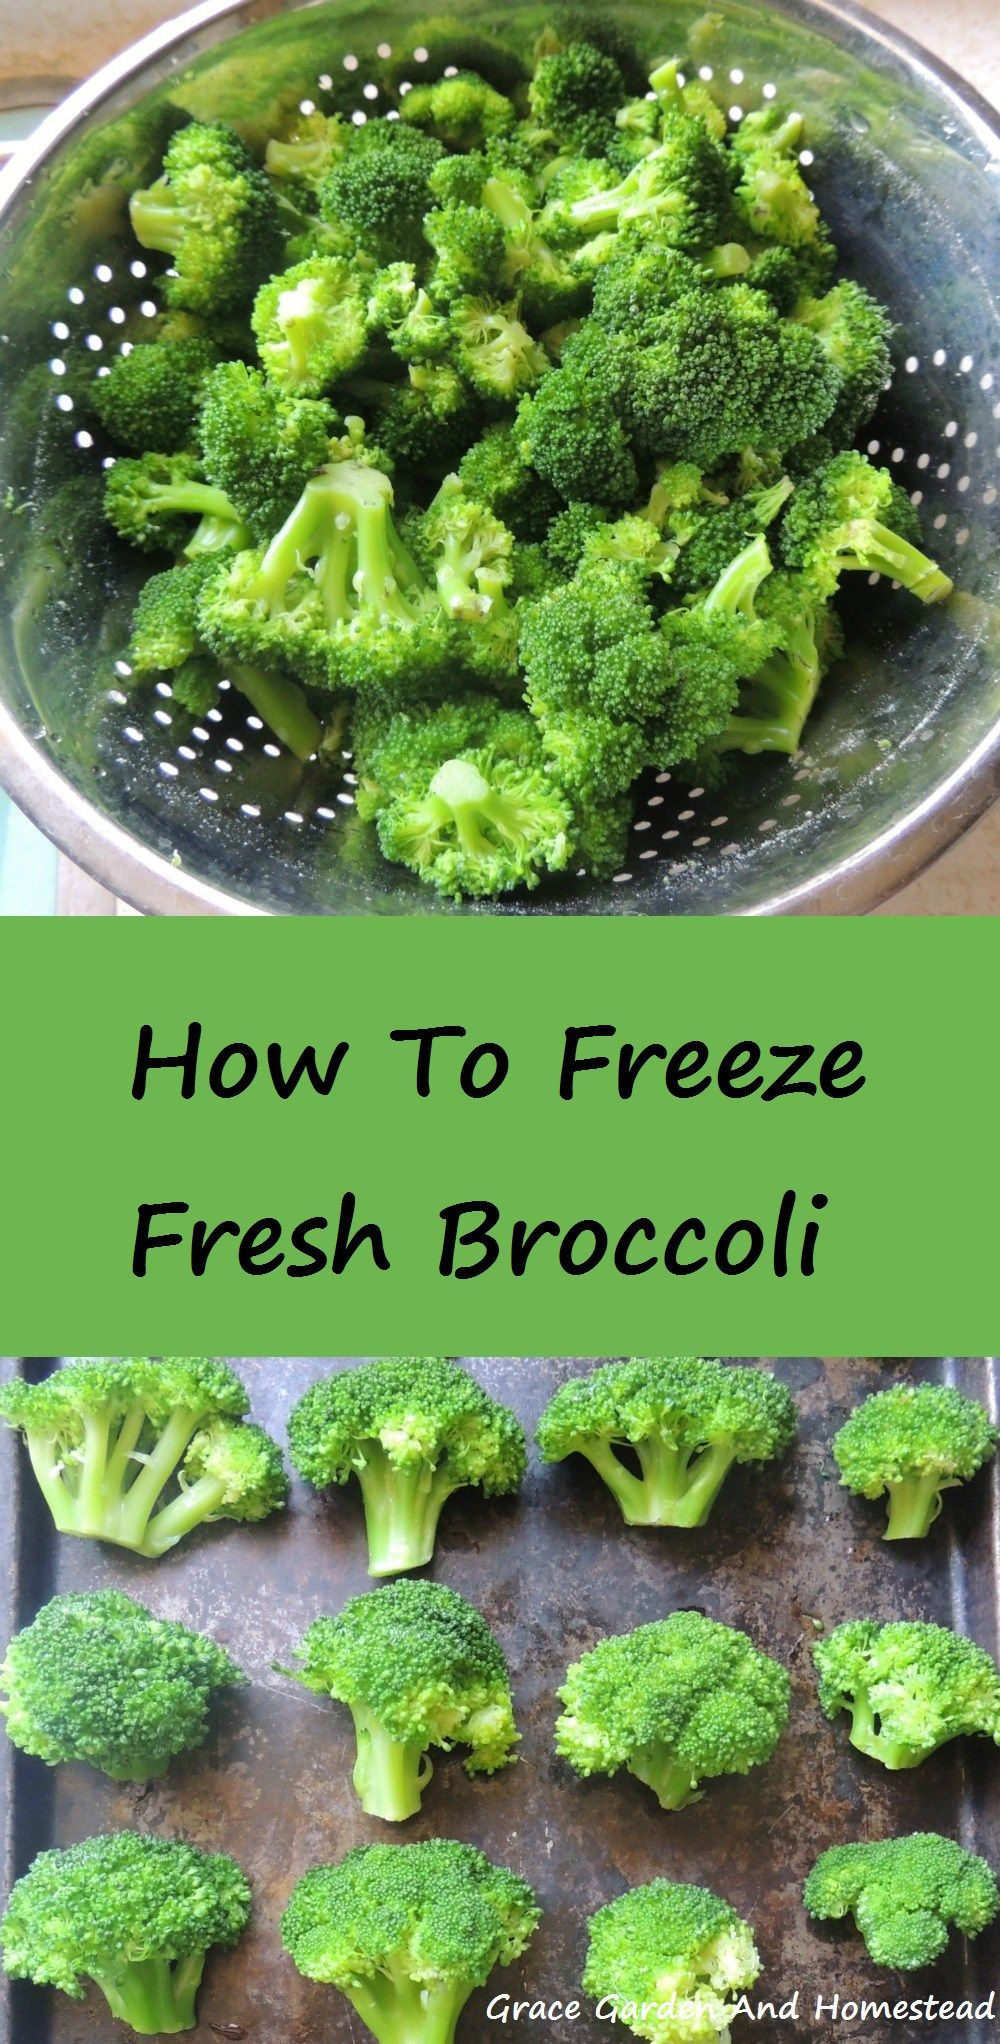 How to freeze fresh broccoli fresh broccoli frozen